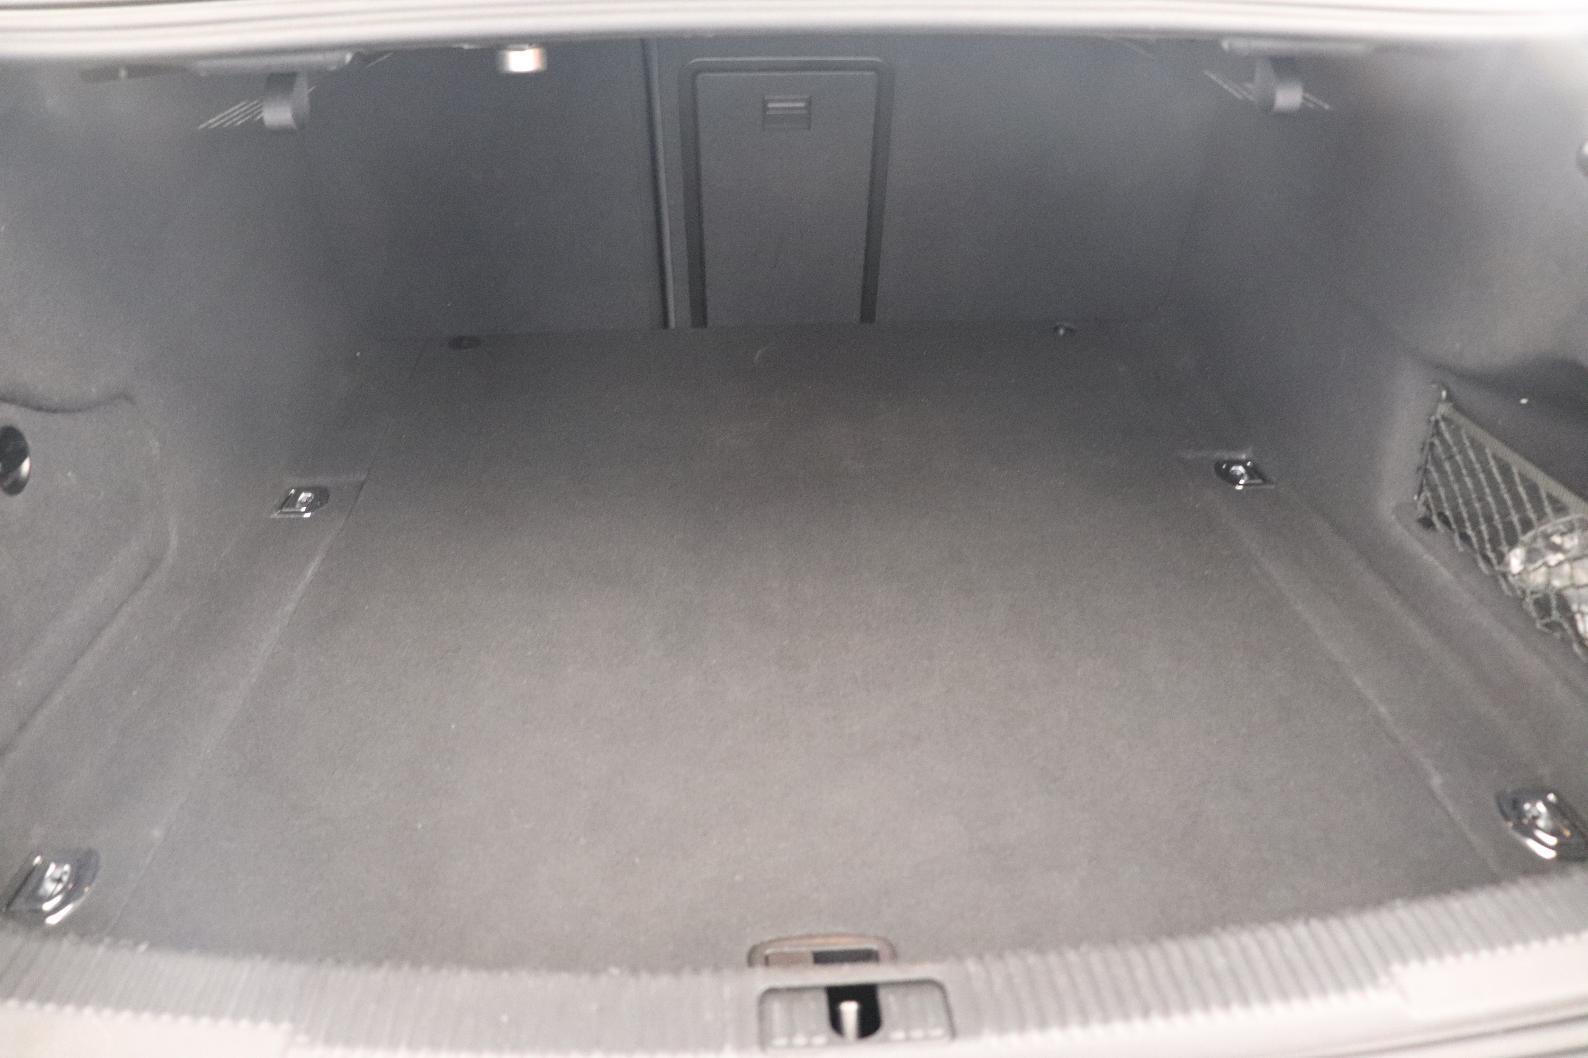 AUDI A6 V6 3.0 TDI 272 S Tronic 7 Quattro Ambition Luxe